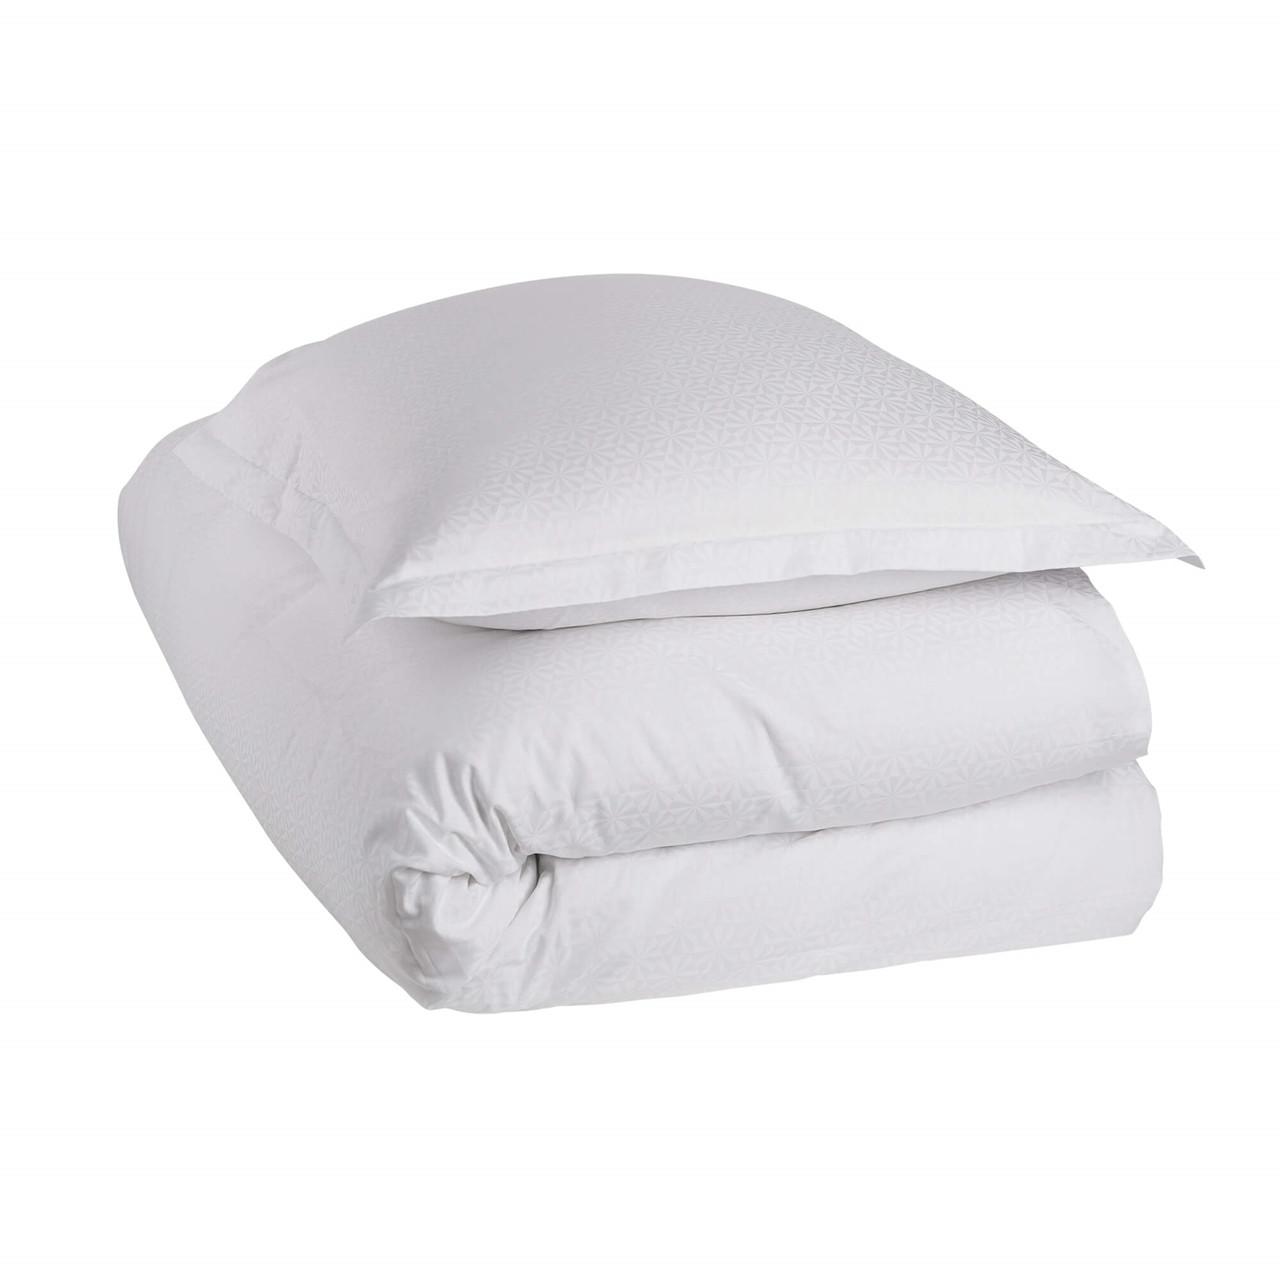 Køb WINDMILLS sengetøj White (White, 1 stk. 60×63-Pude / 1 stk. 140×220-Dyne)